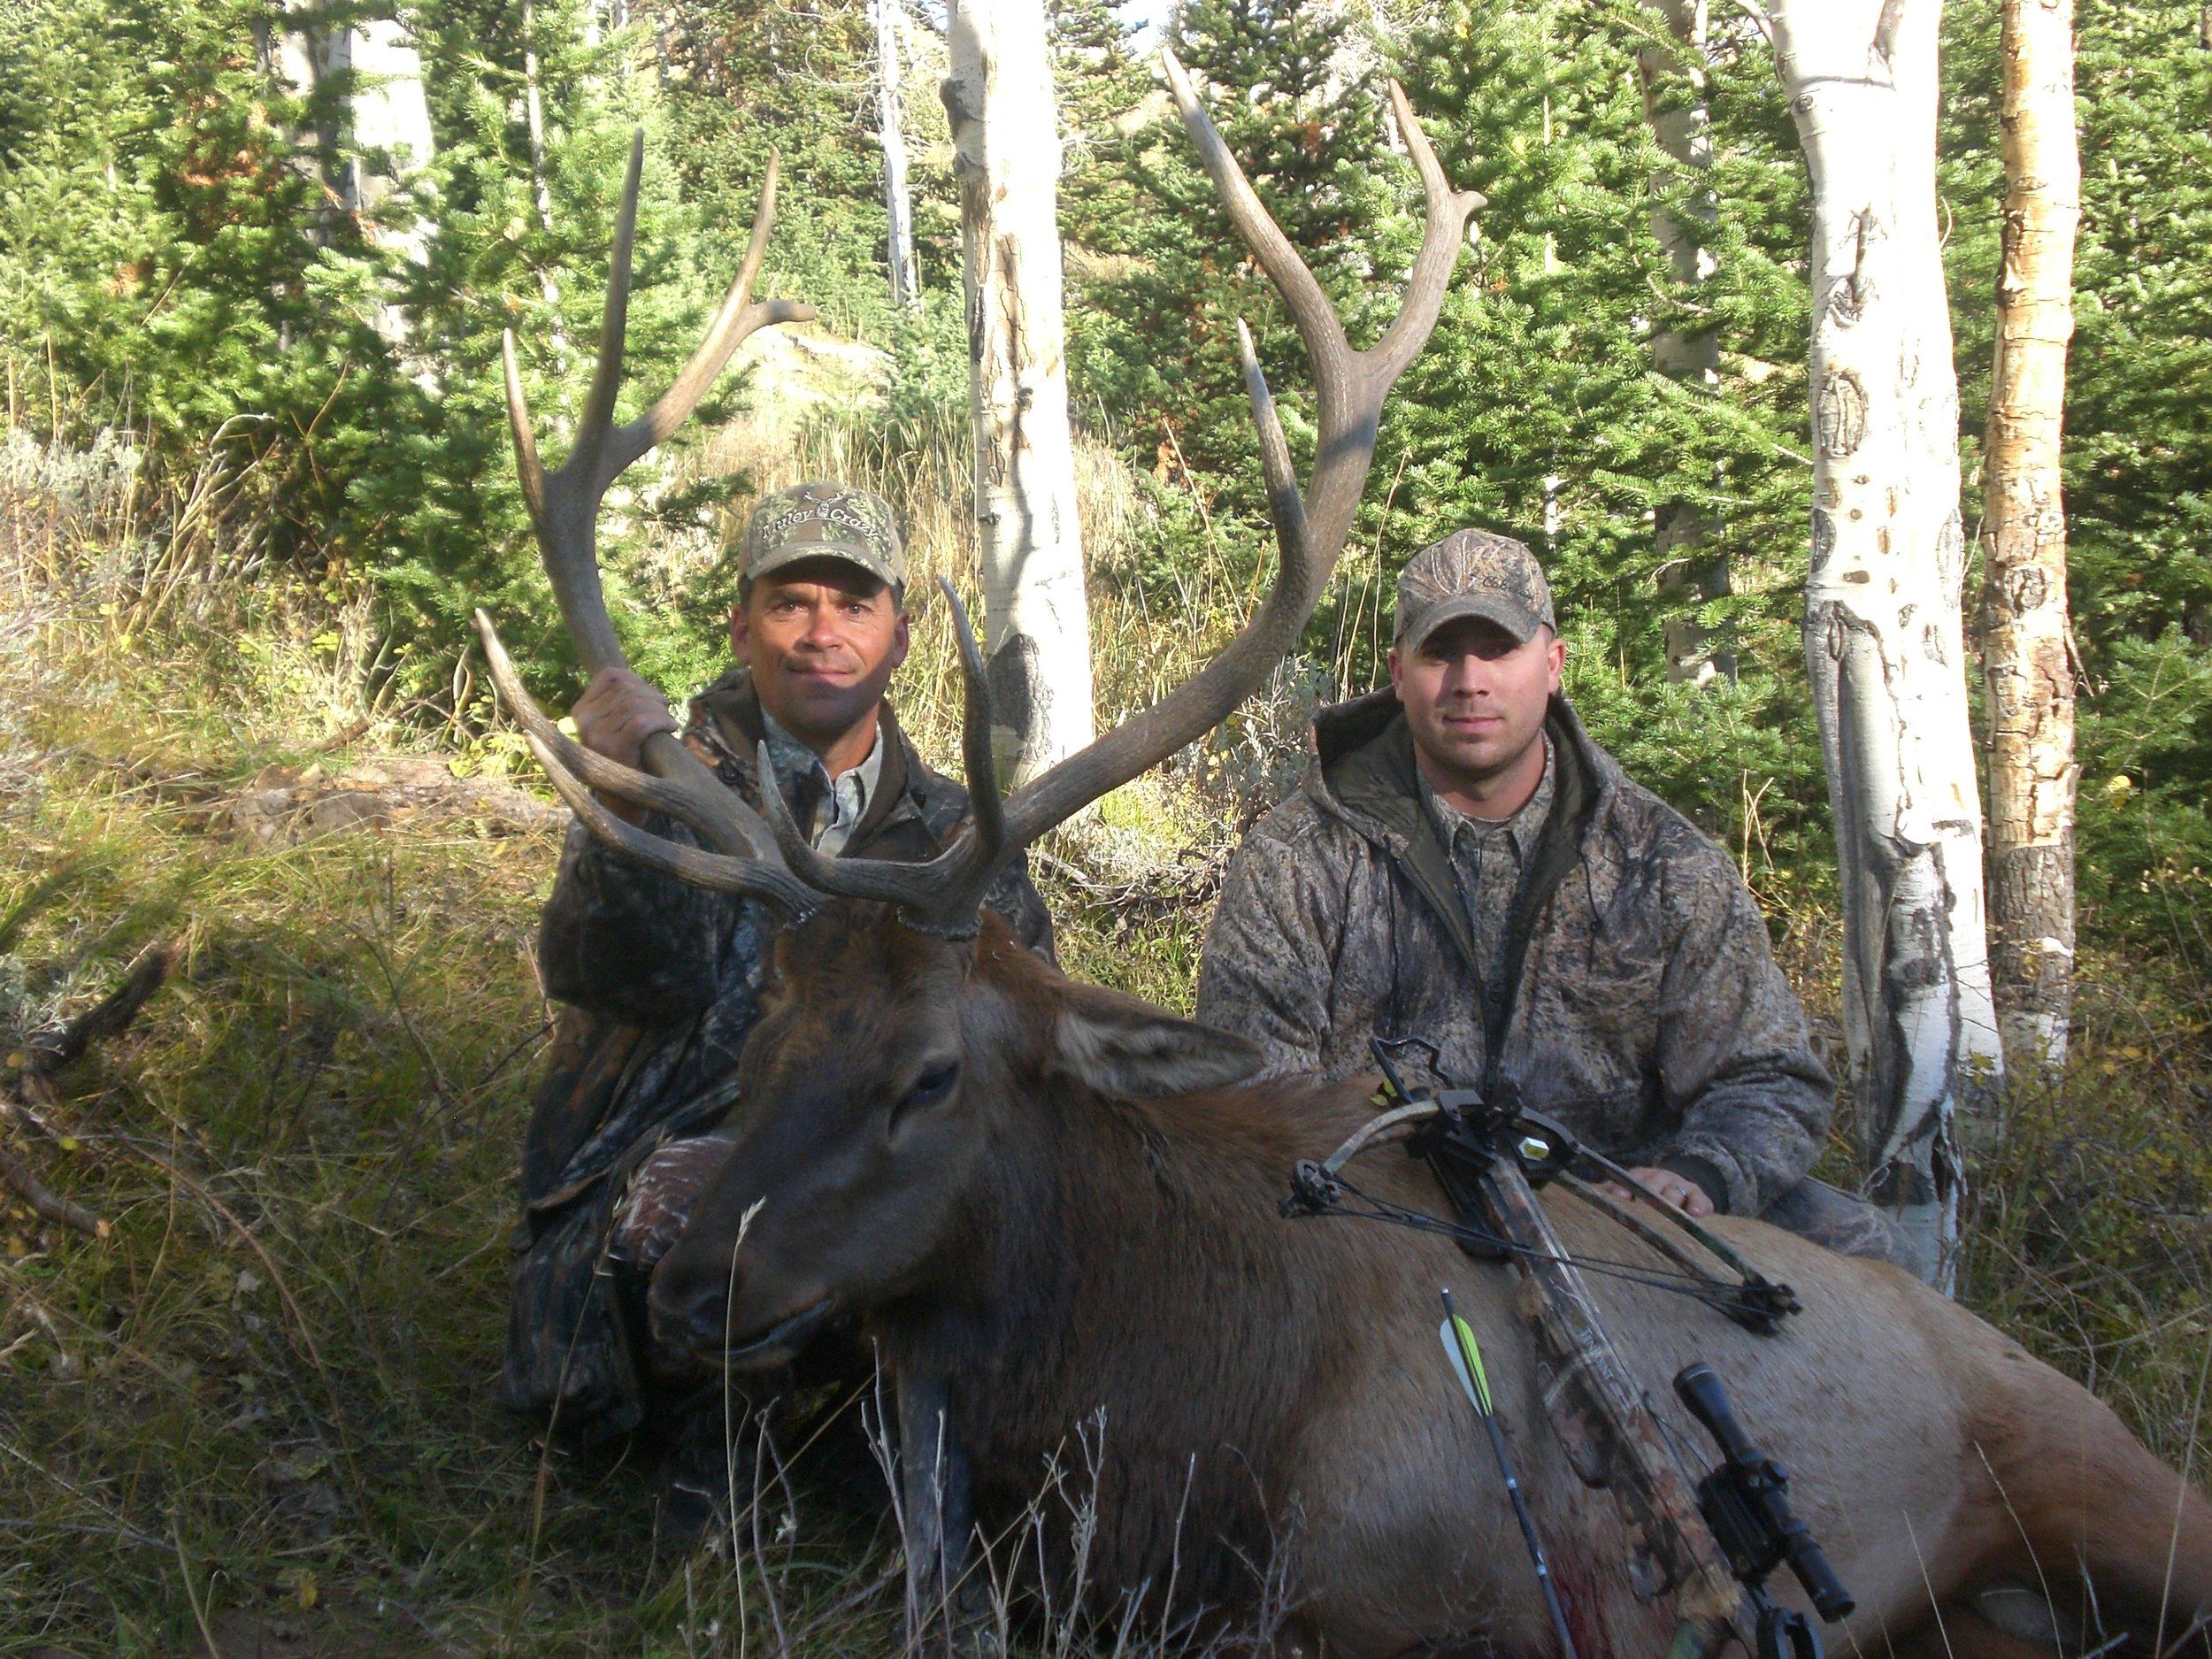 Wyoming09Elk_Little Mtns 159.jpg